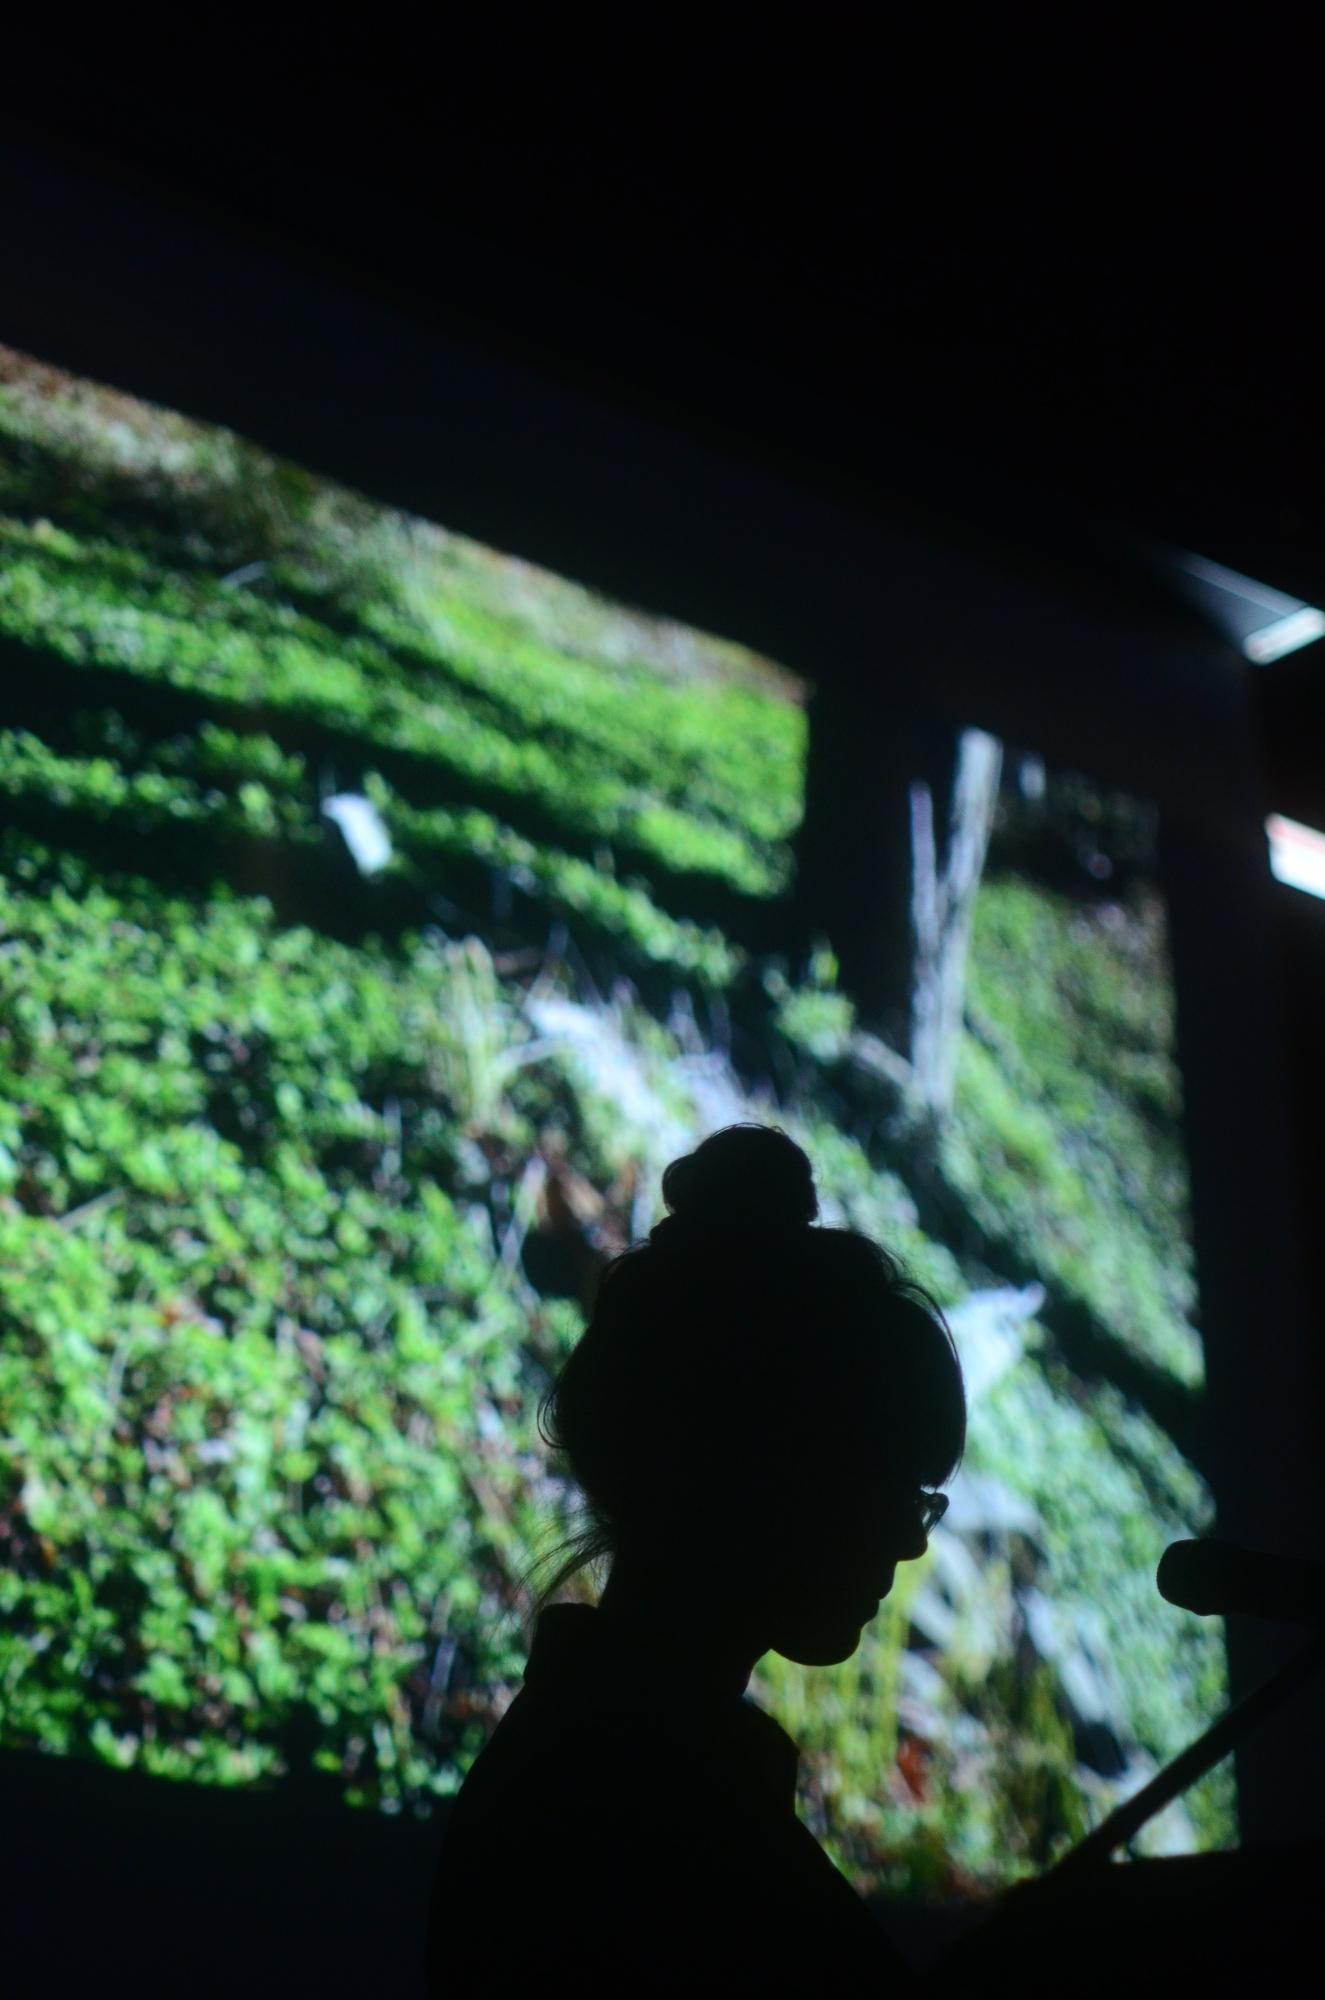 D'Arcy Wilson, The Memorialist: Keynote Address, 2017. Photo: Will Baker.